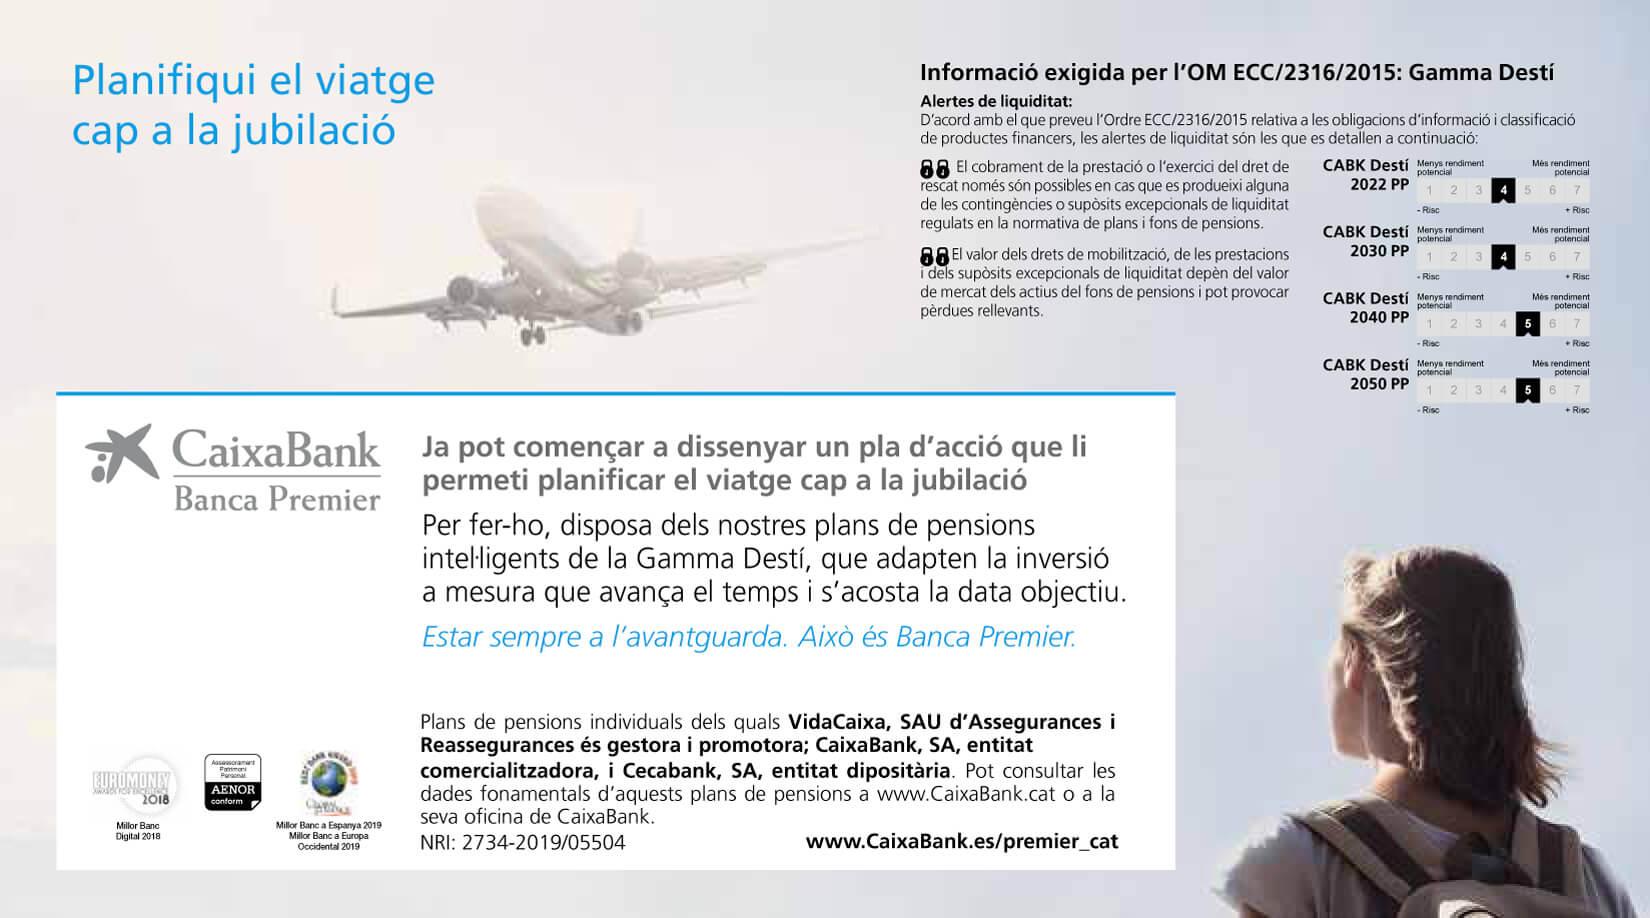 CaixaBank